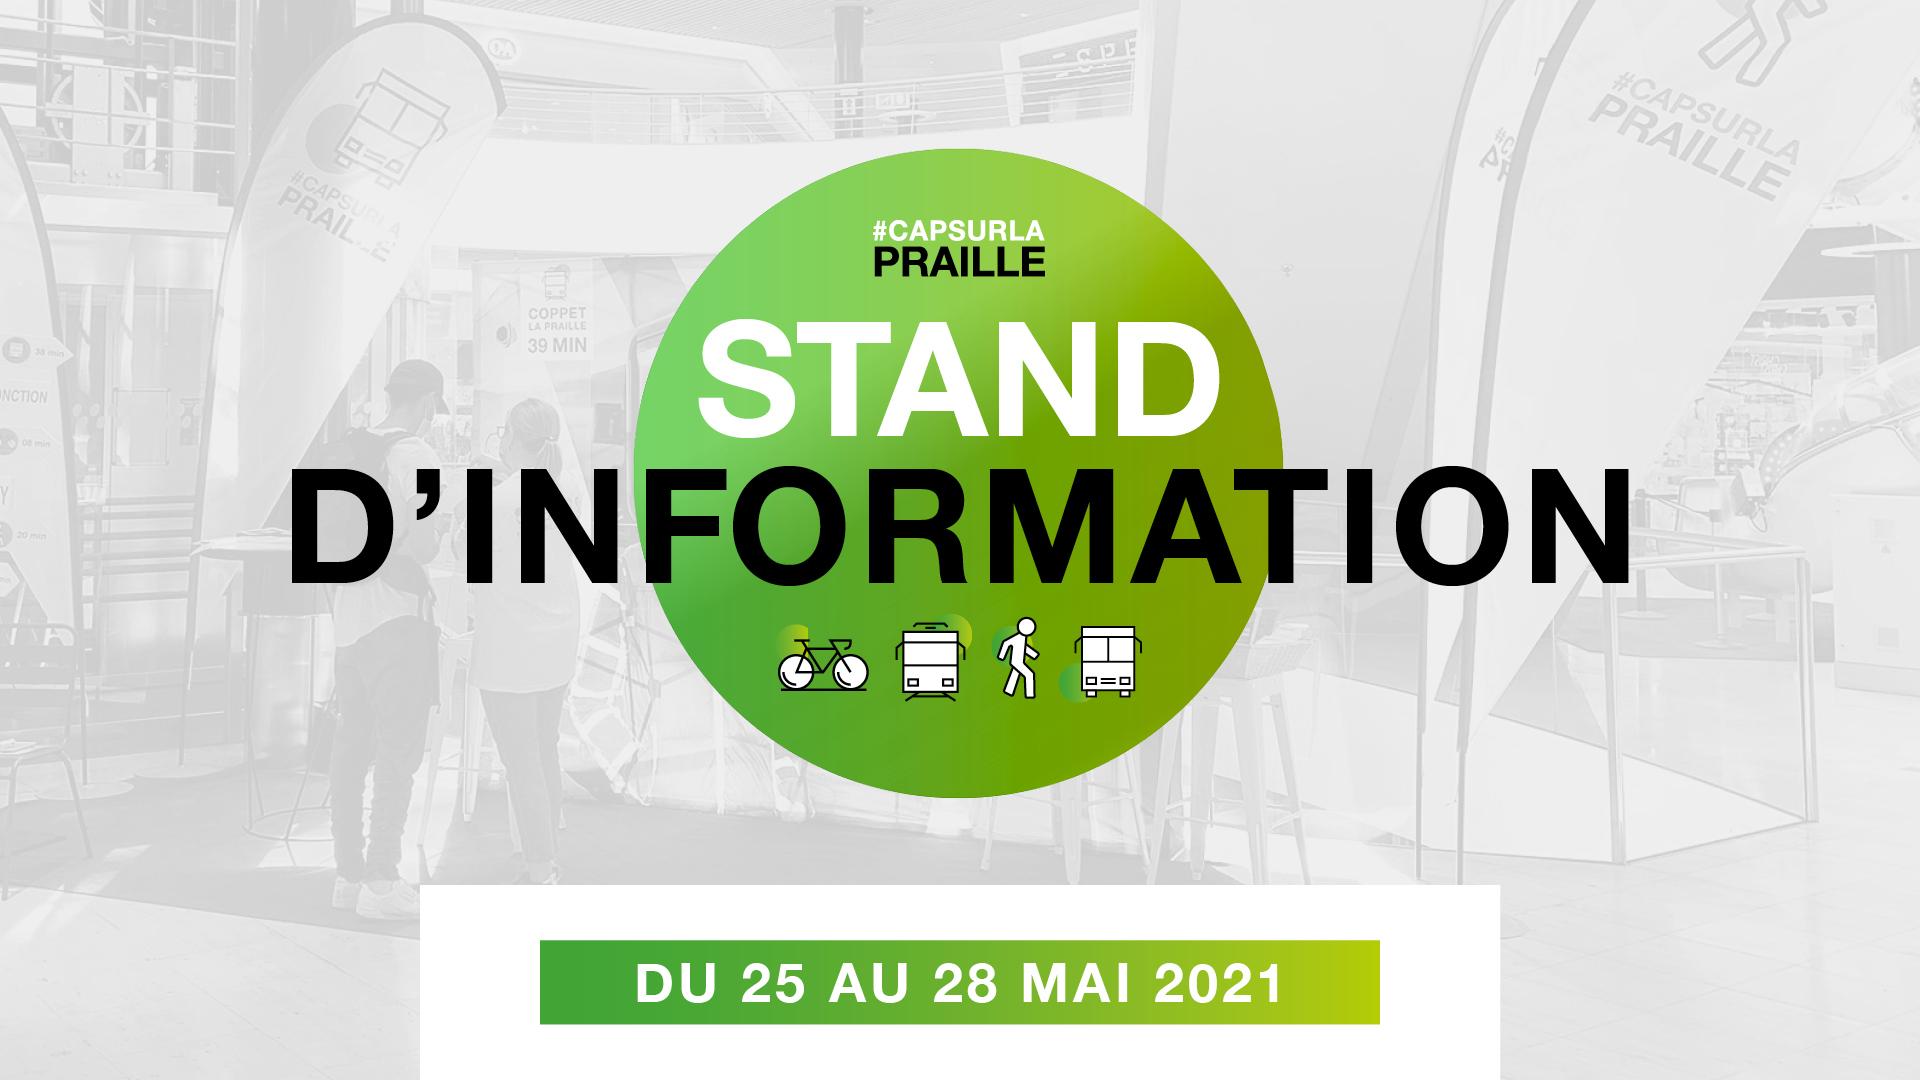 Stand d'information mobilité